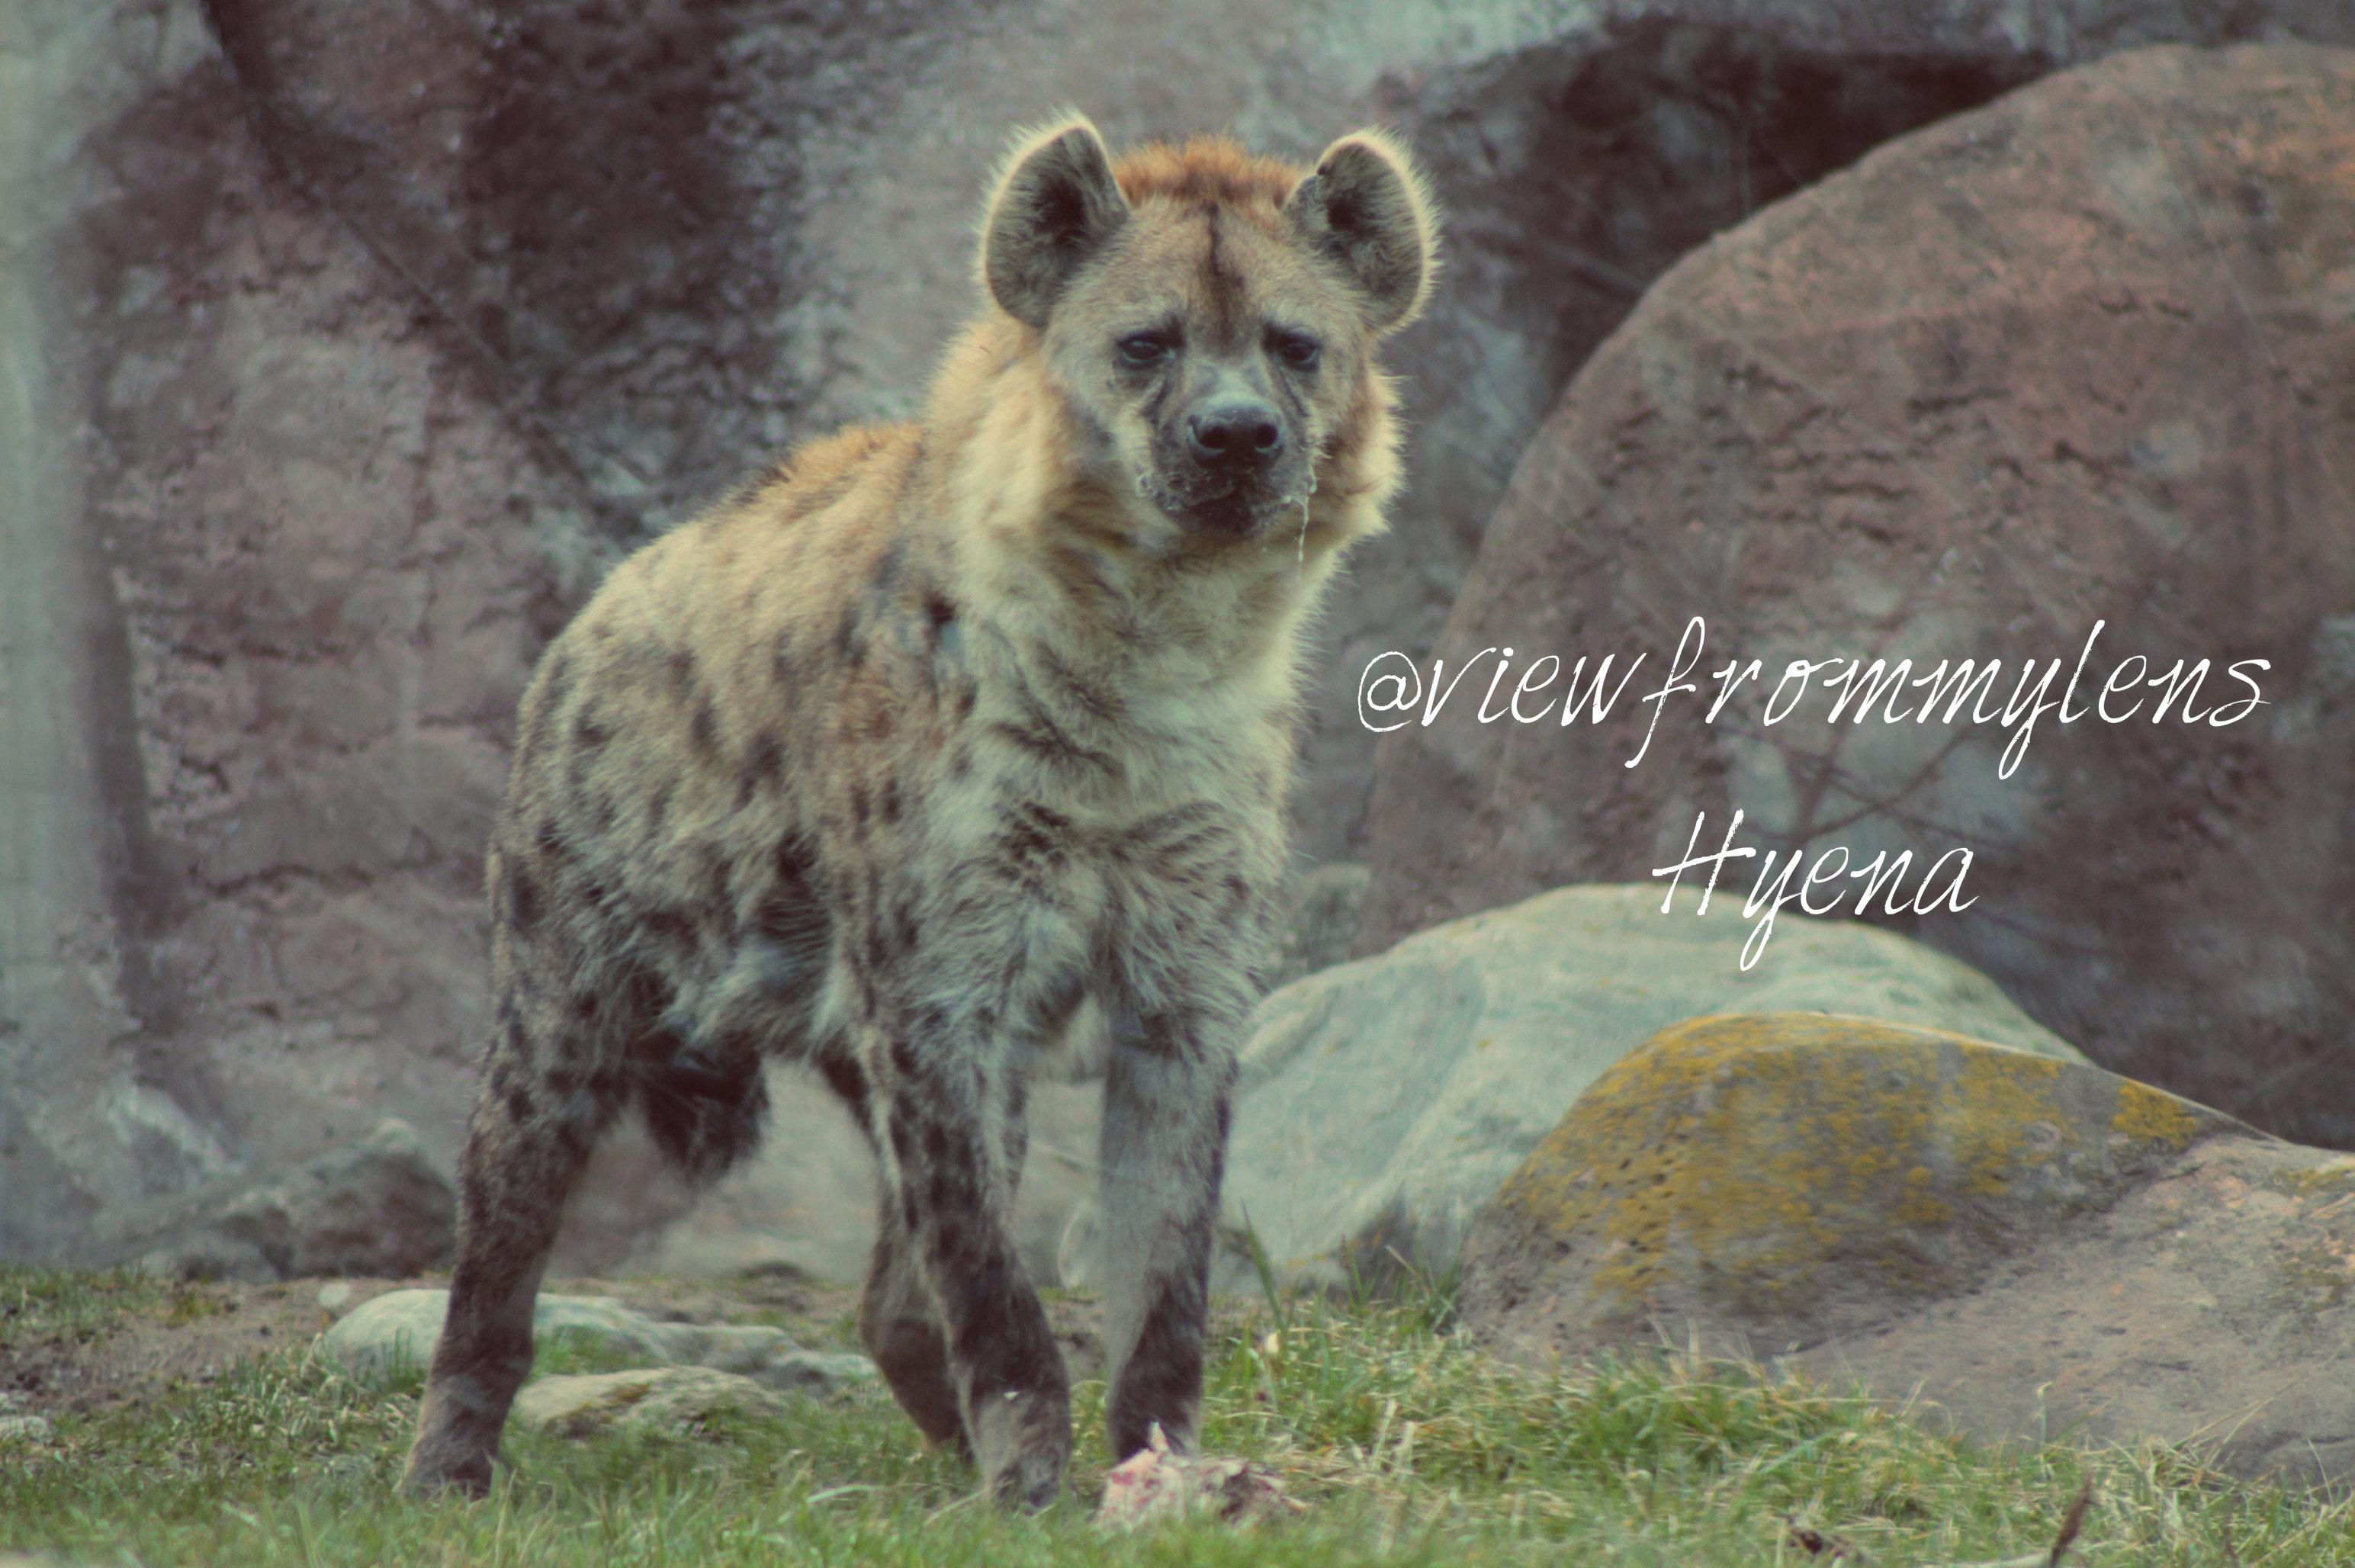 Hyena #124